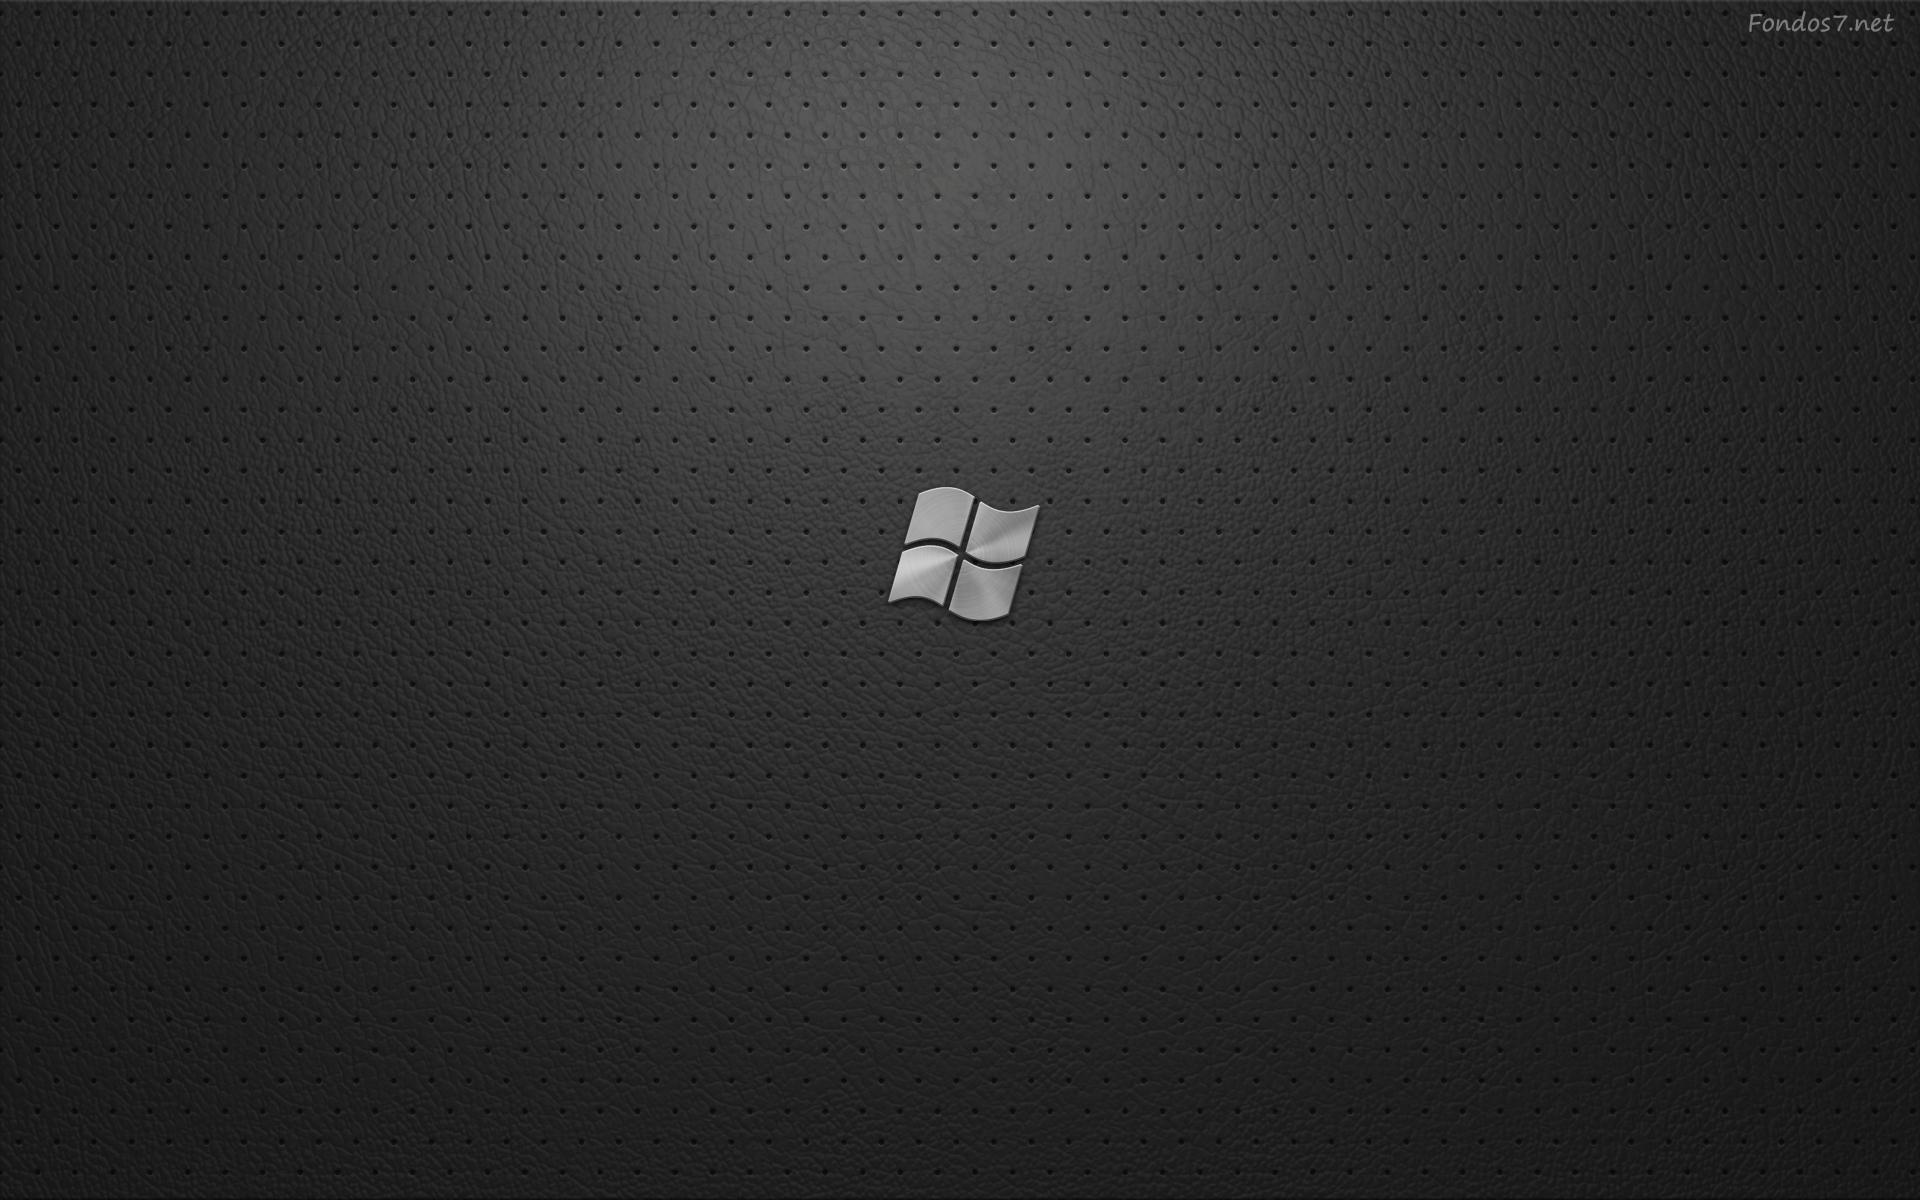 Download windows seven black 1024x768 wallpaper 1771 - Fondos7 Net Wallpaper Original Wallpapers Windows Seven Black